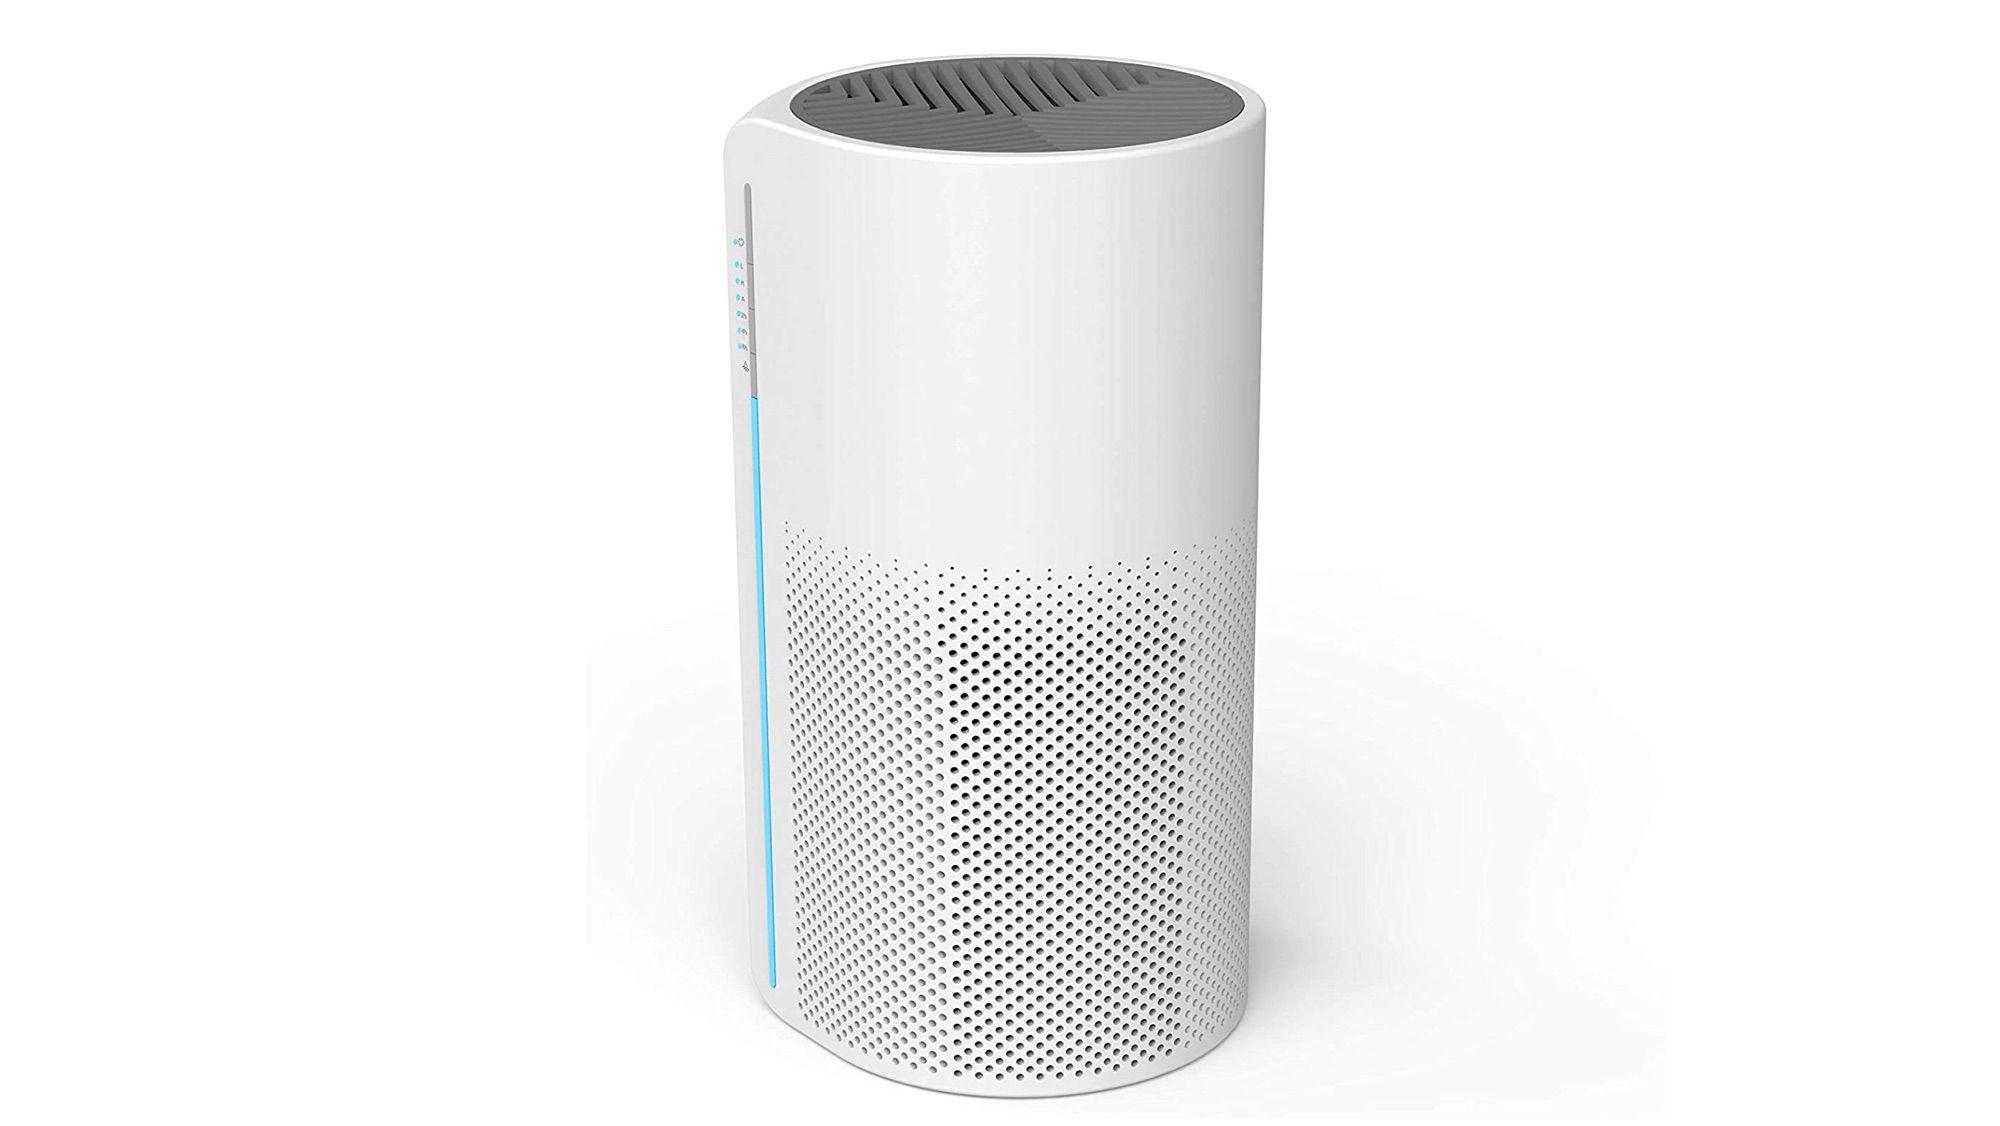 'Sensibo Pure' Air Purifier Gains HomeKit Support